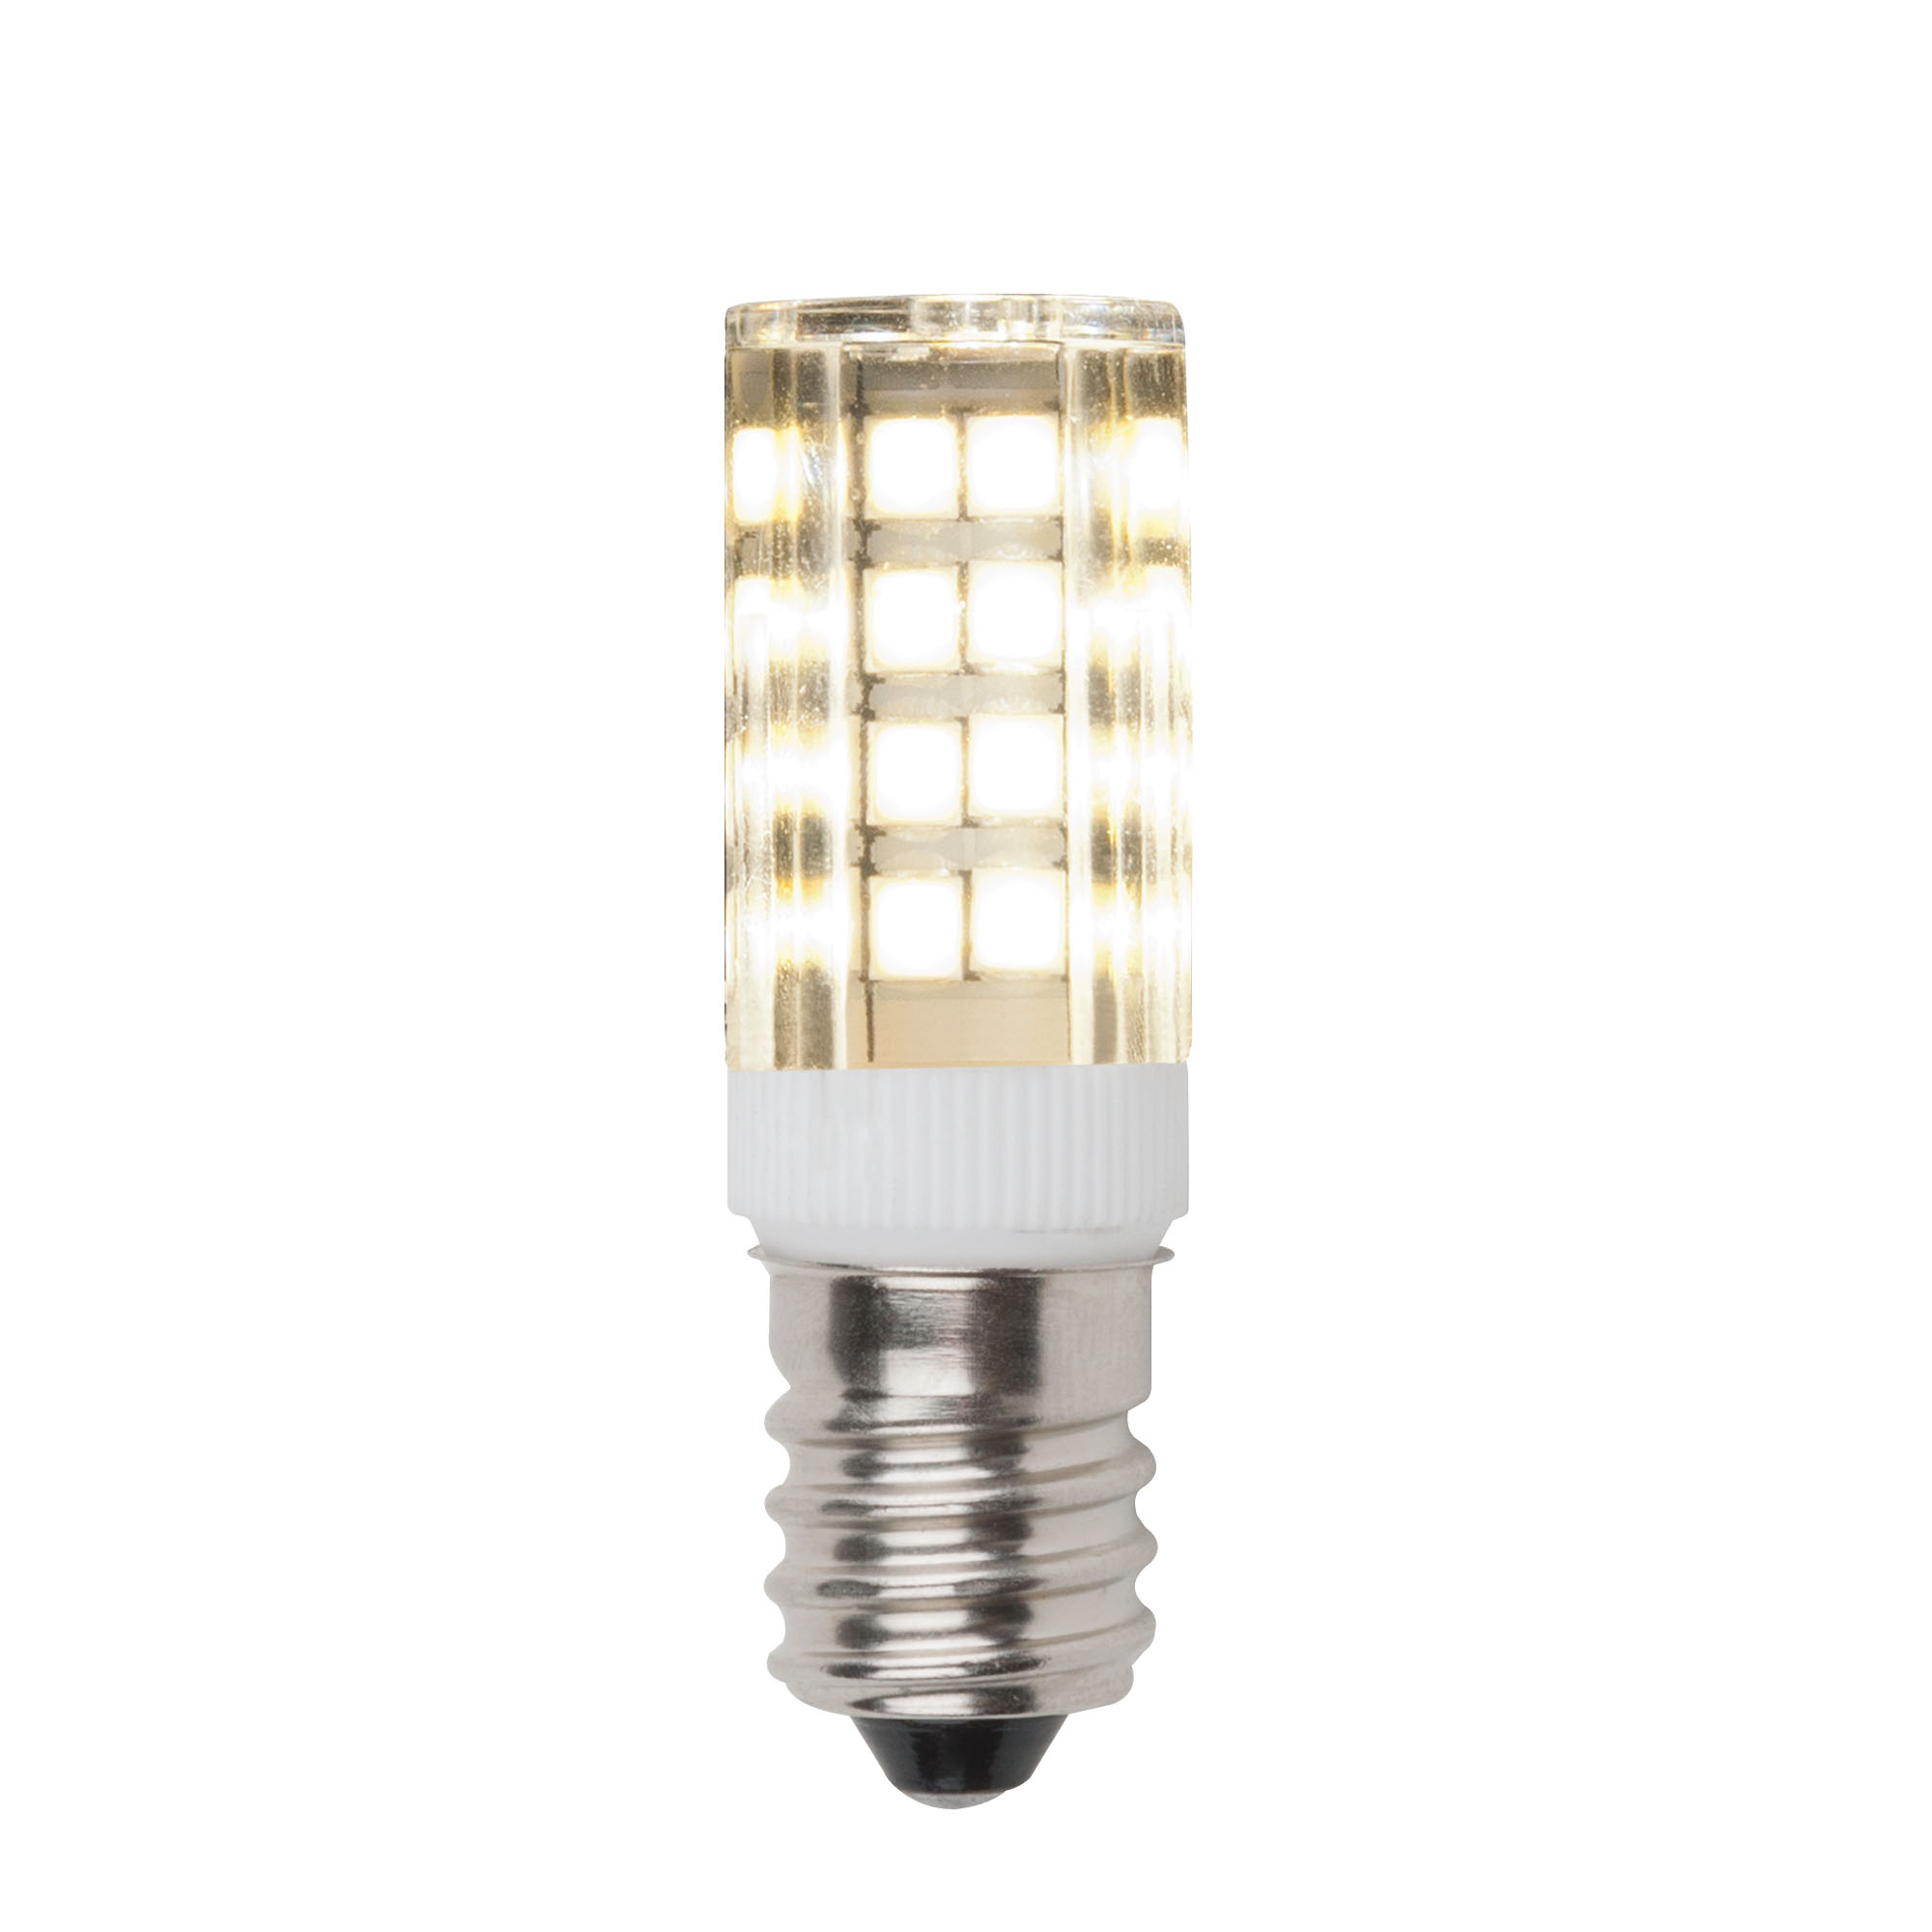 Лампа светодиодная Uniel Led-y16-4w/ww/e14/cl plz04wh 25шт